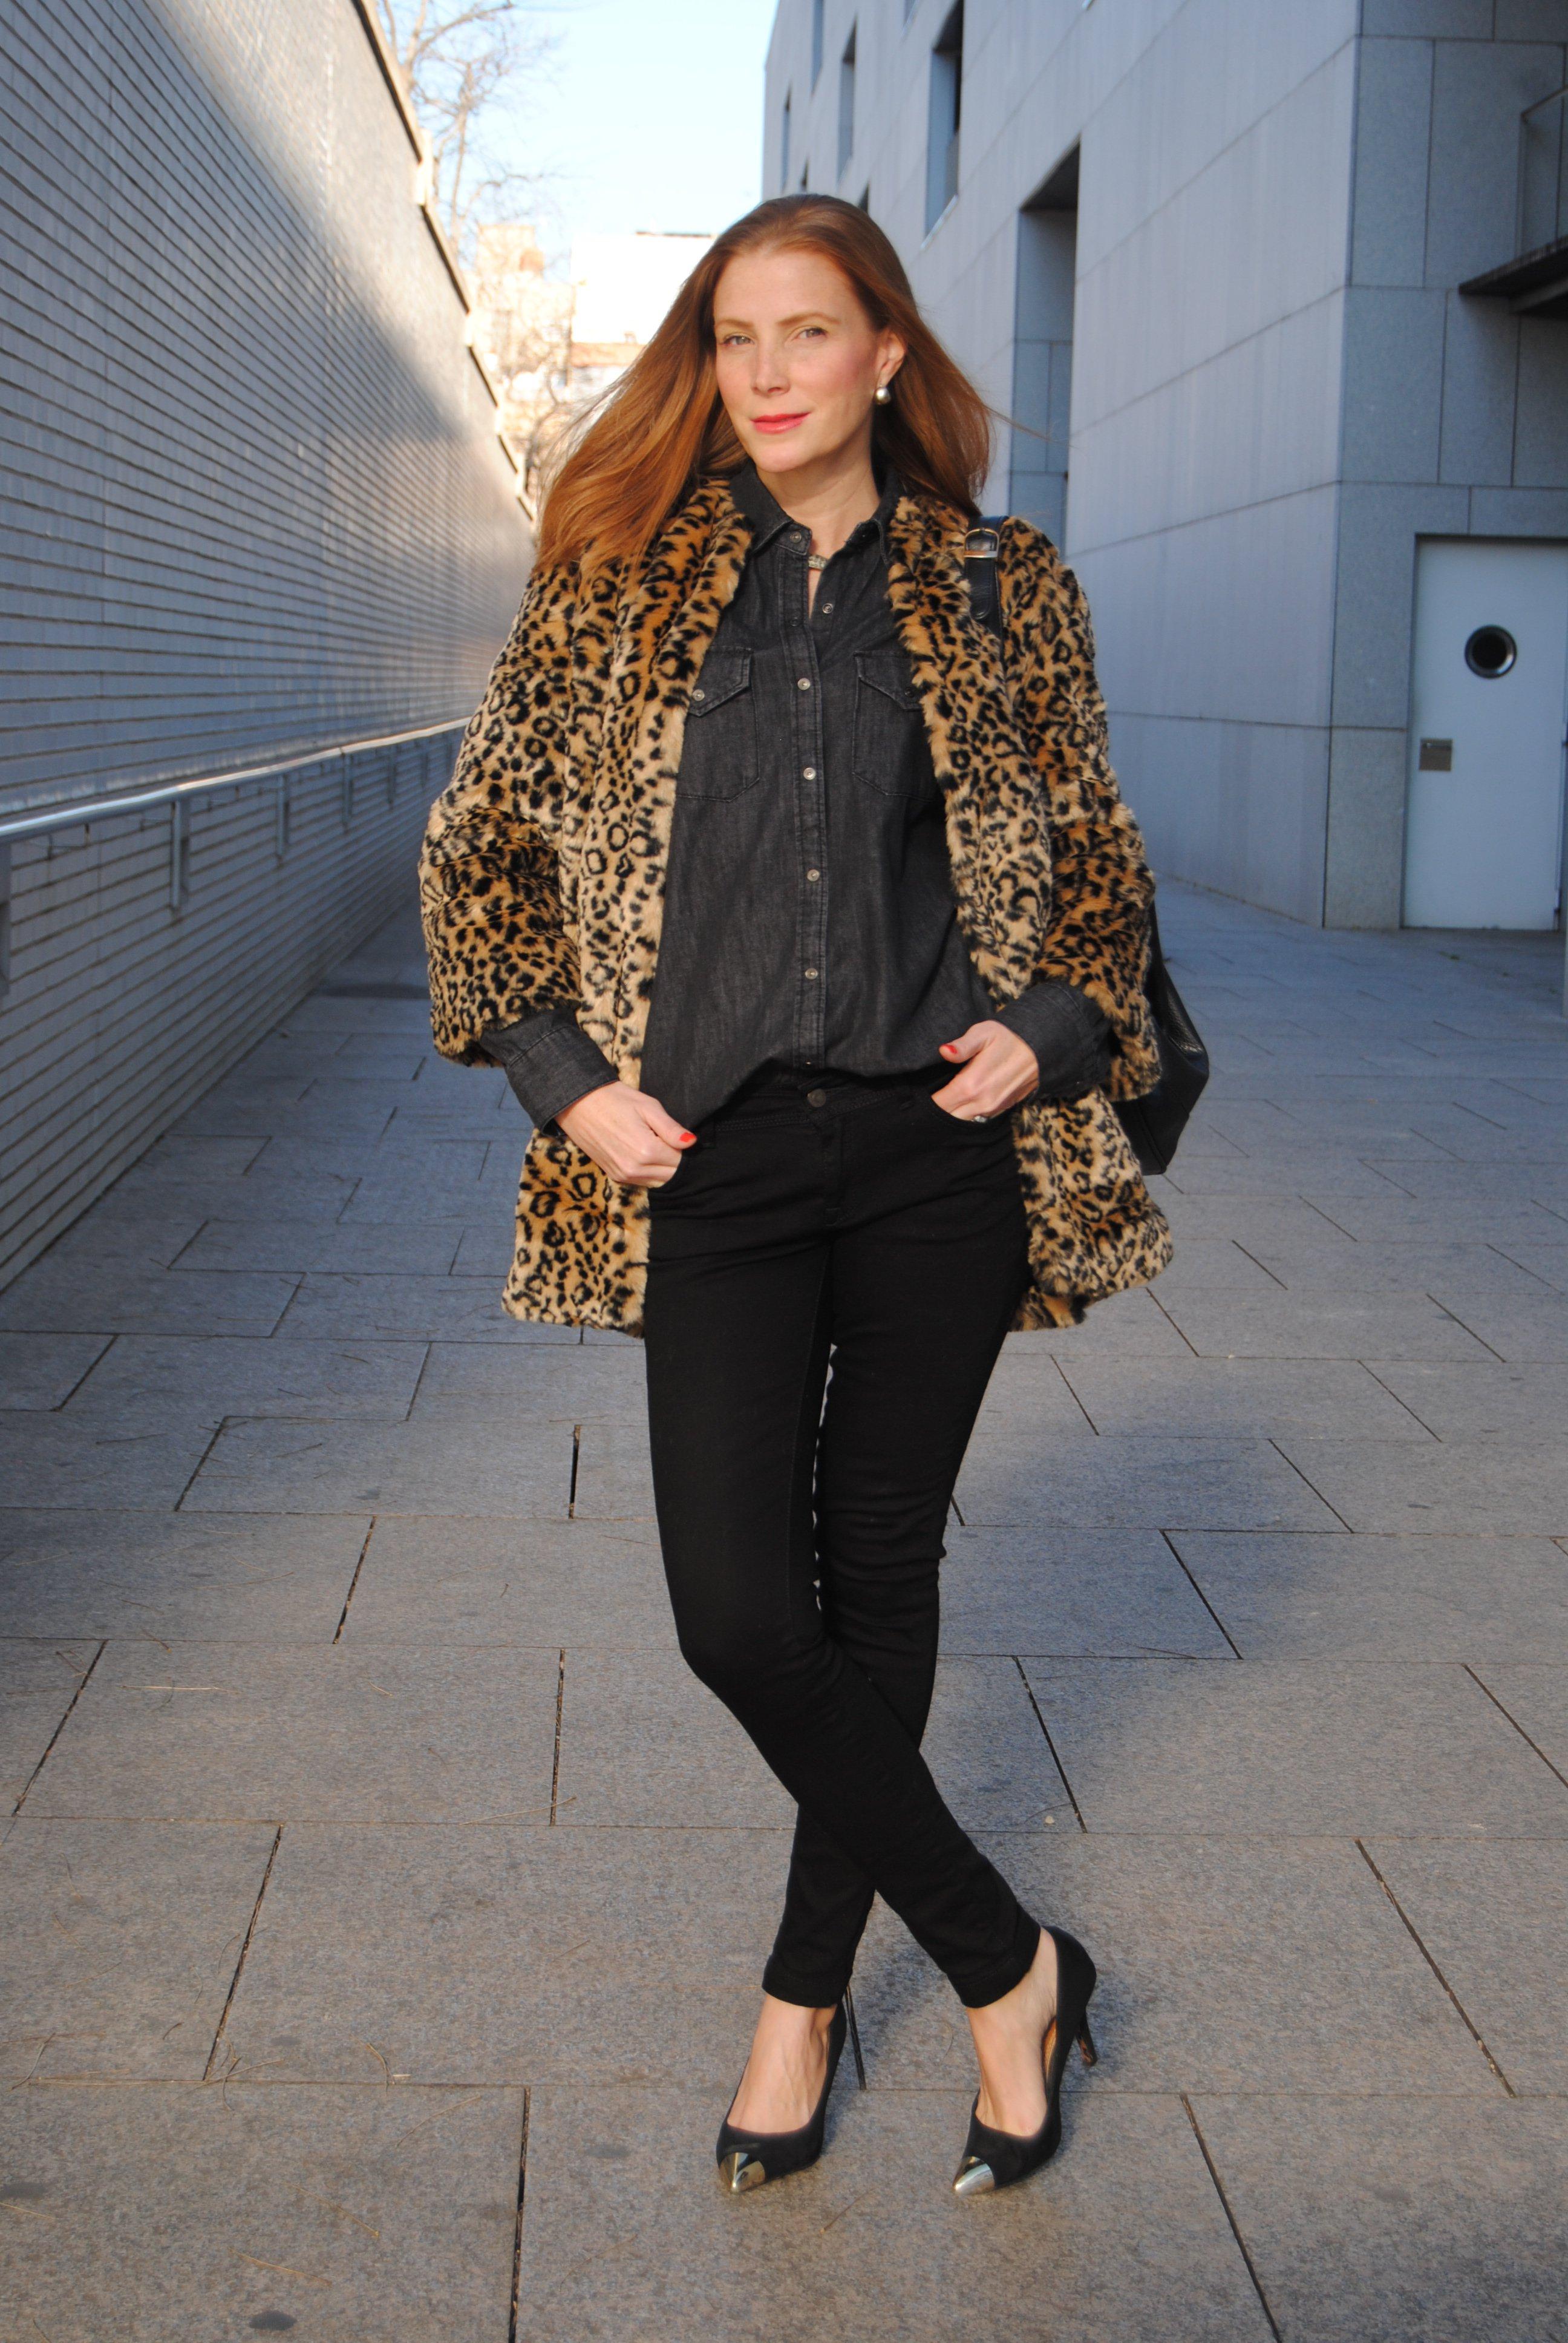 Colourvibes, abrigo leopardo El look de la semana StyleLovely